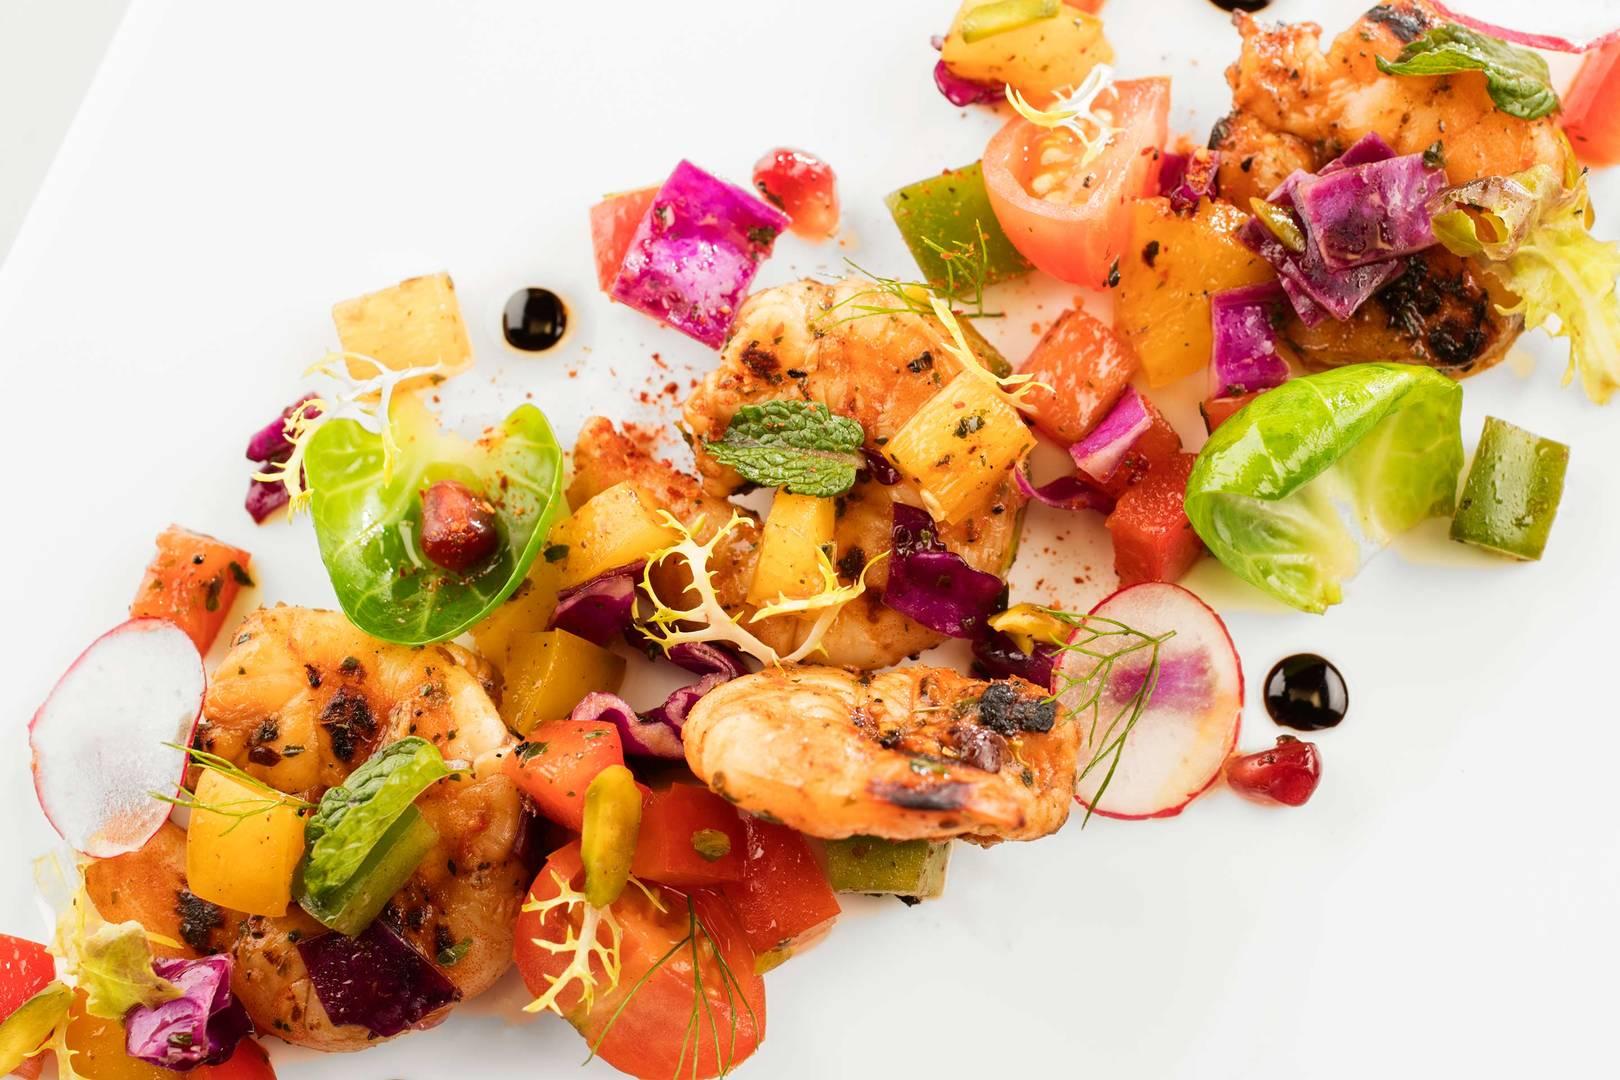 https://cdn.jumeirah.com/-/mediadh/DH/Hospitality/Jumeirah/Restaurants/Dubai/Burj-Al-Arab-Bab-Al-Yam/Restaurant-Gallery/Burj-Al-Arab-Restaurants-Bab-Al-Yam-Cajun-Spiced-Prawns-Salad_6-4.jpg?h=1080&w=1620&hash=EED2FB03E2BA7B078C5CC5E09ECE4AF5